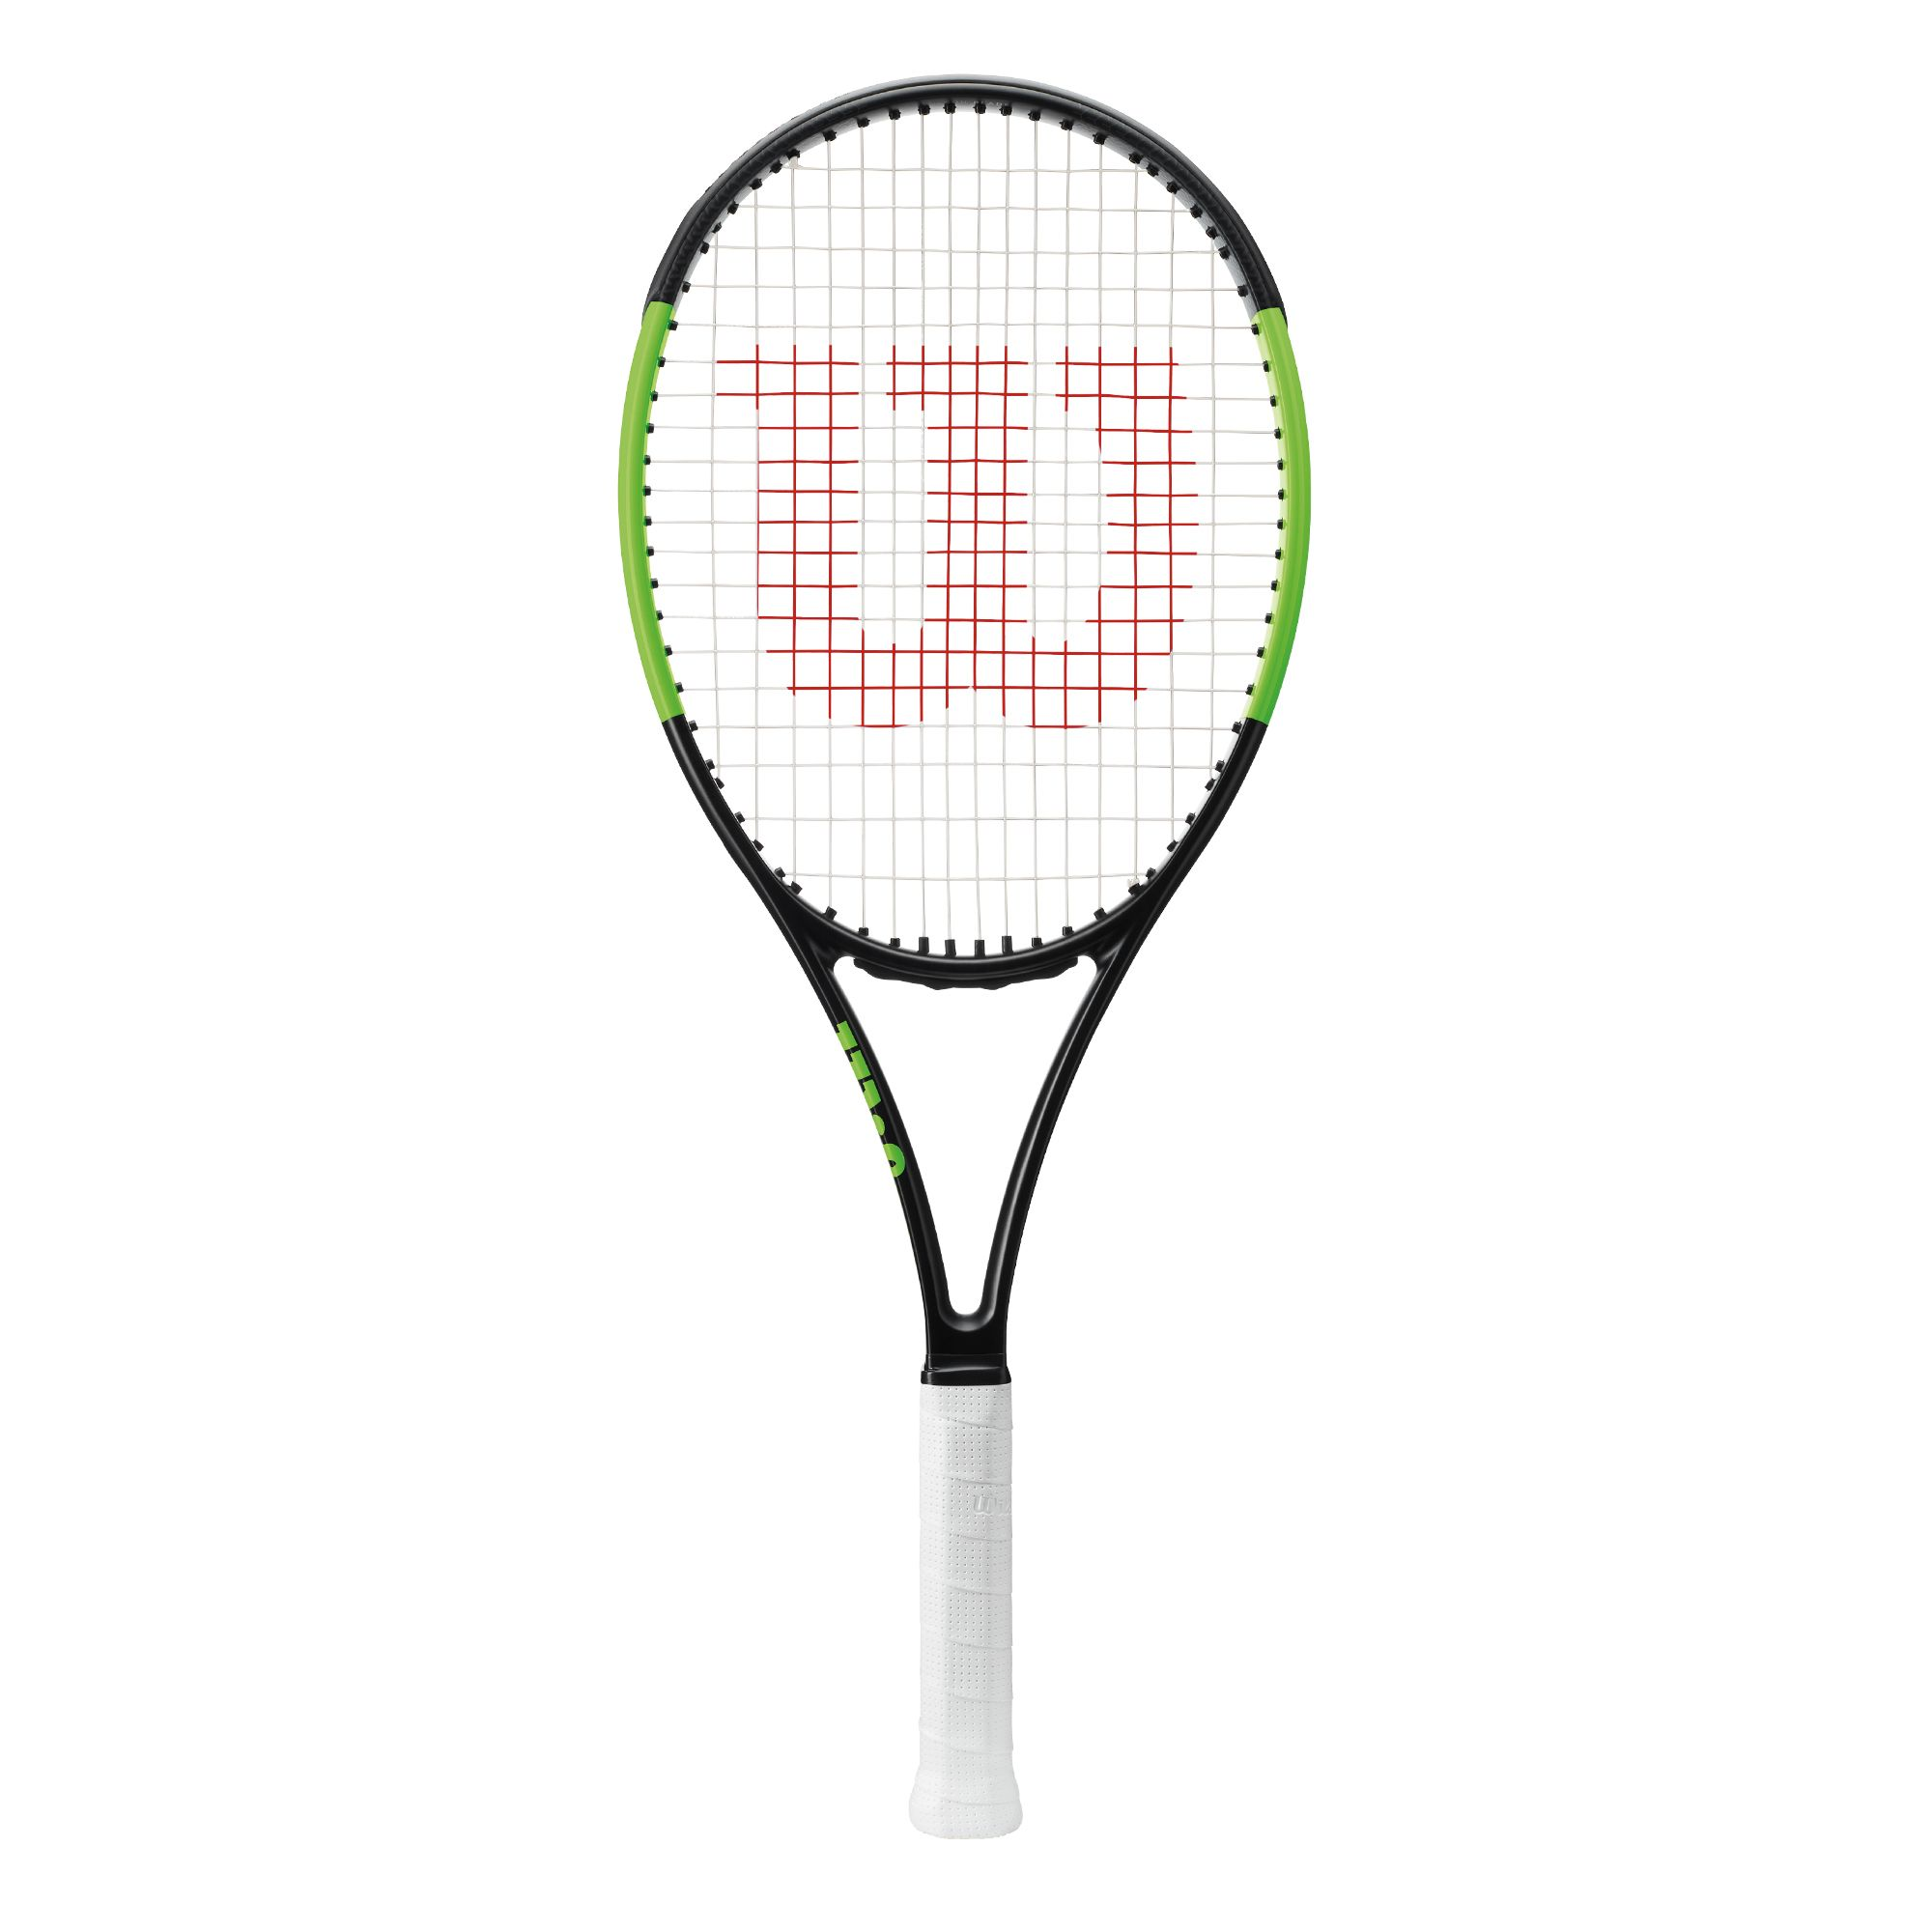 how to put a new grip on a tennis racquet